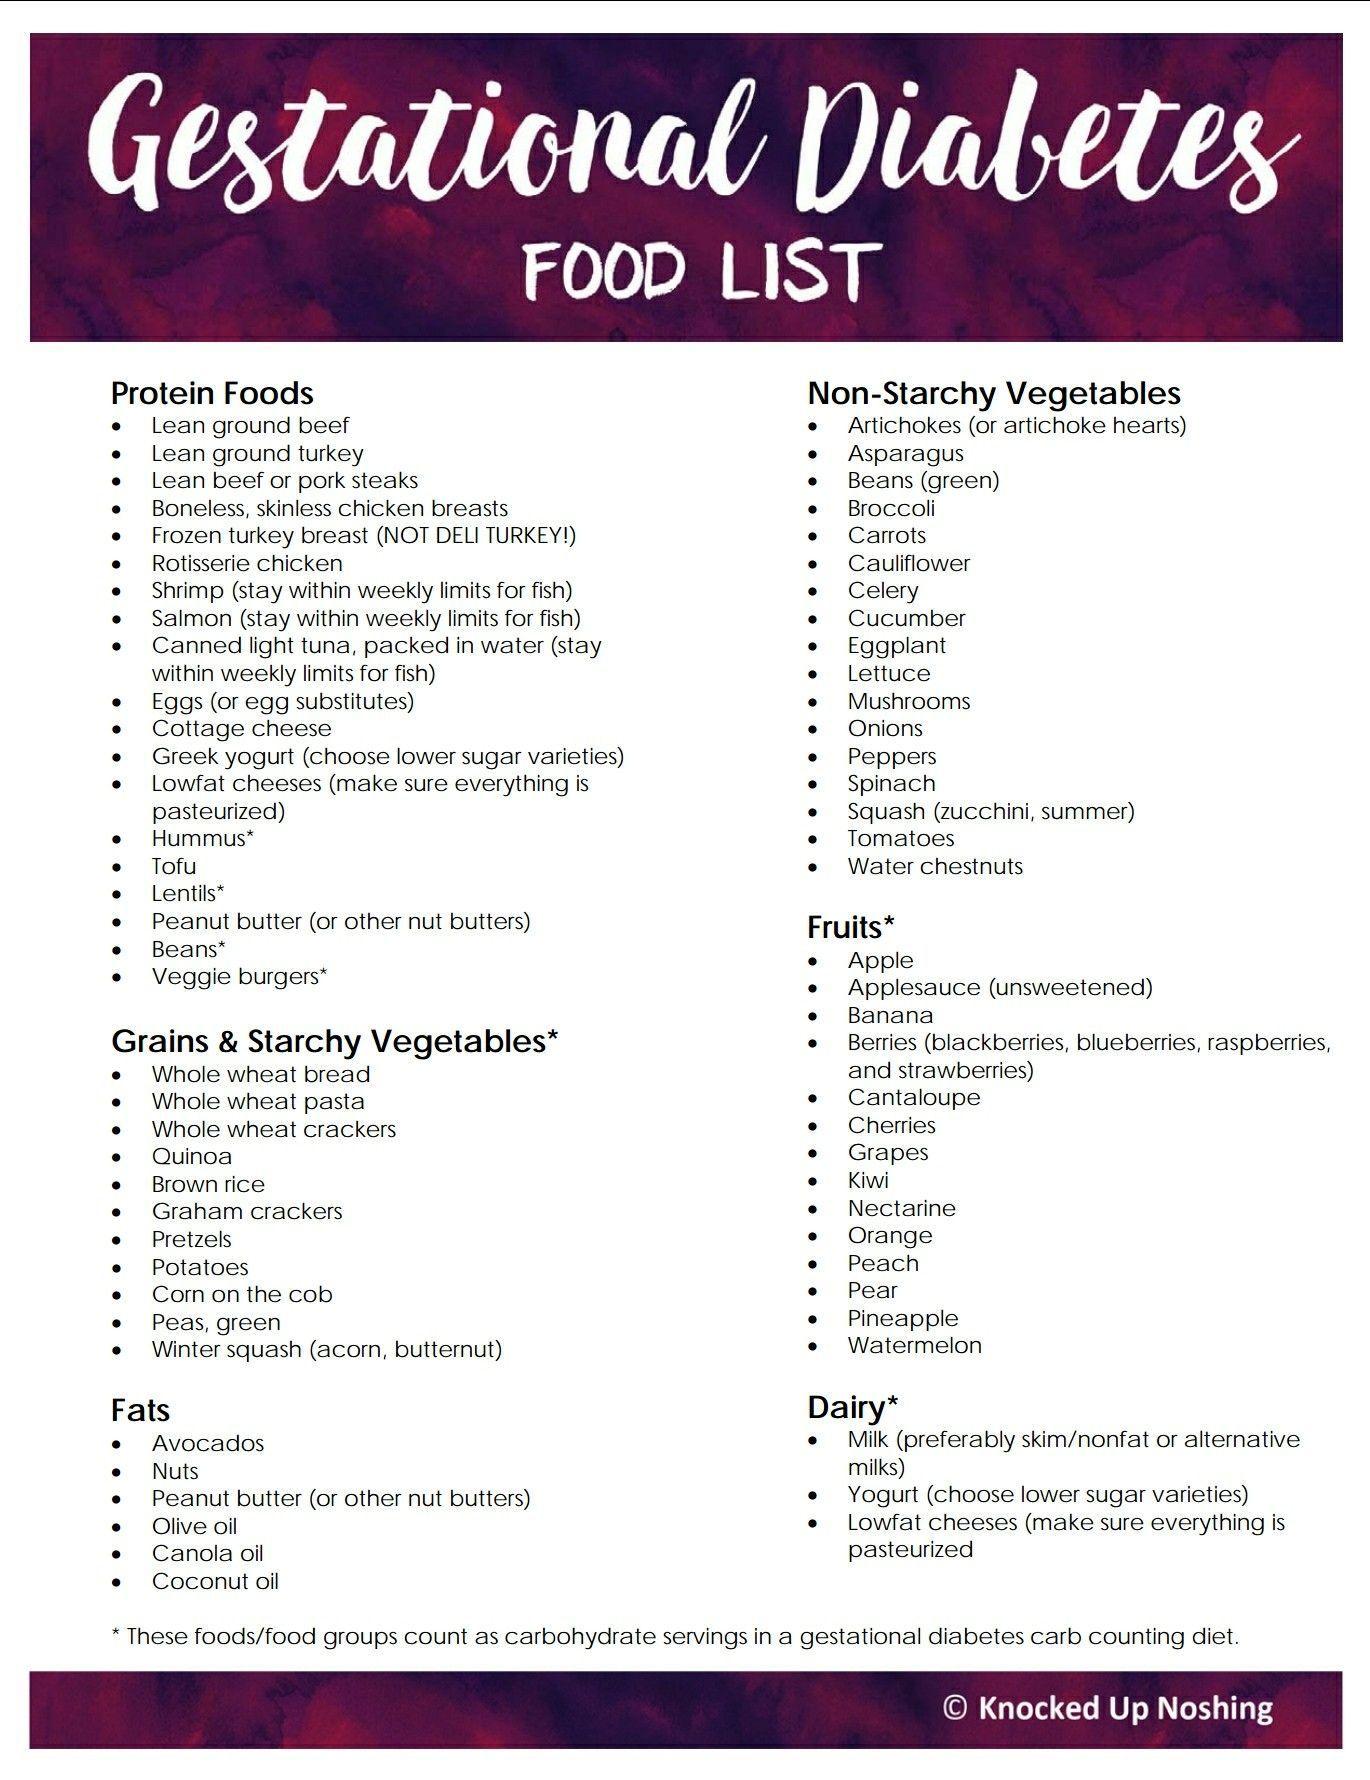 diabetes 2 diet | diabetic recipes i want | pinterest | diabetes